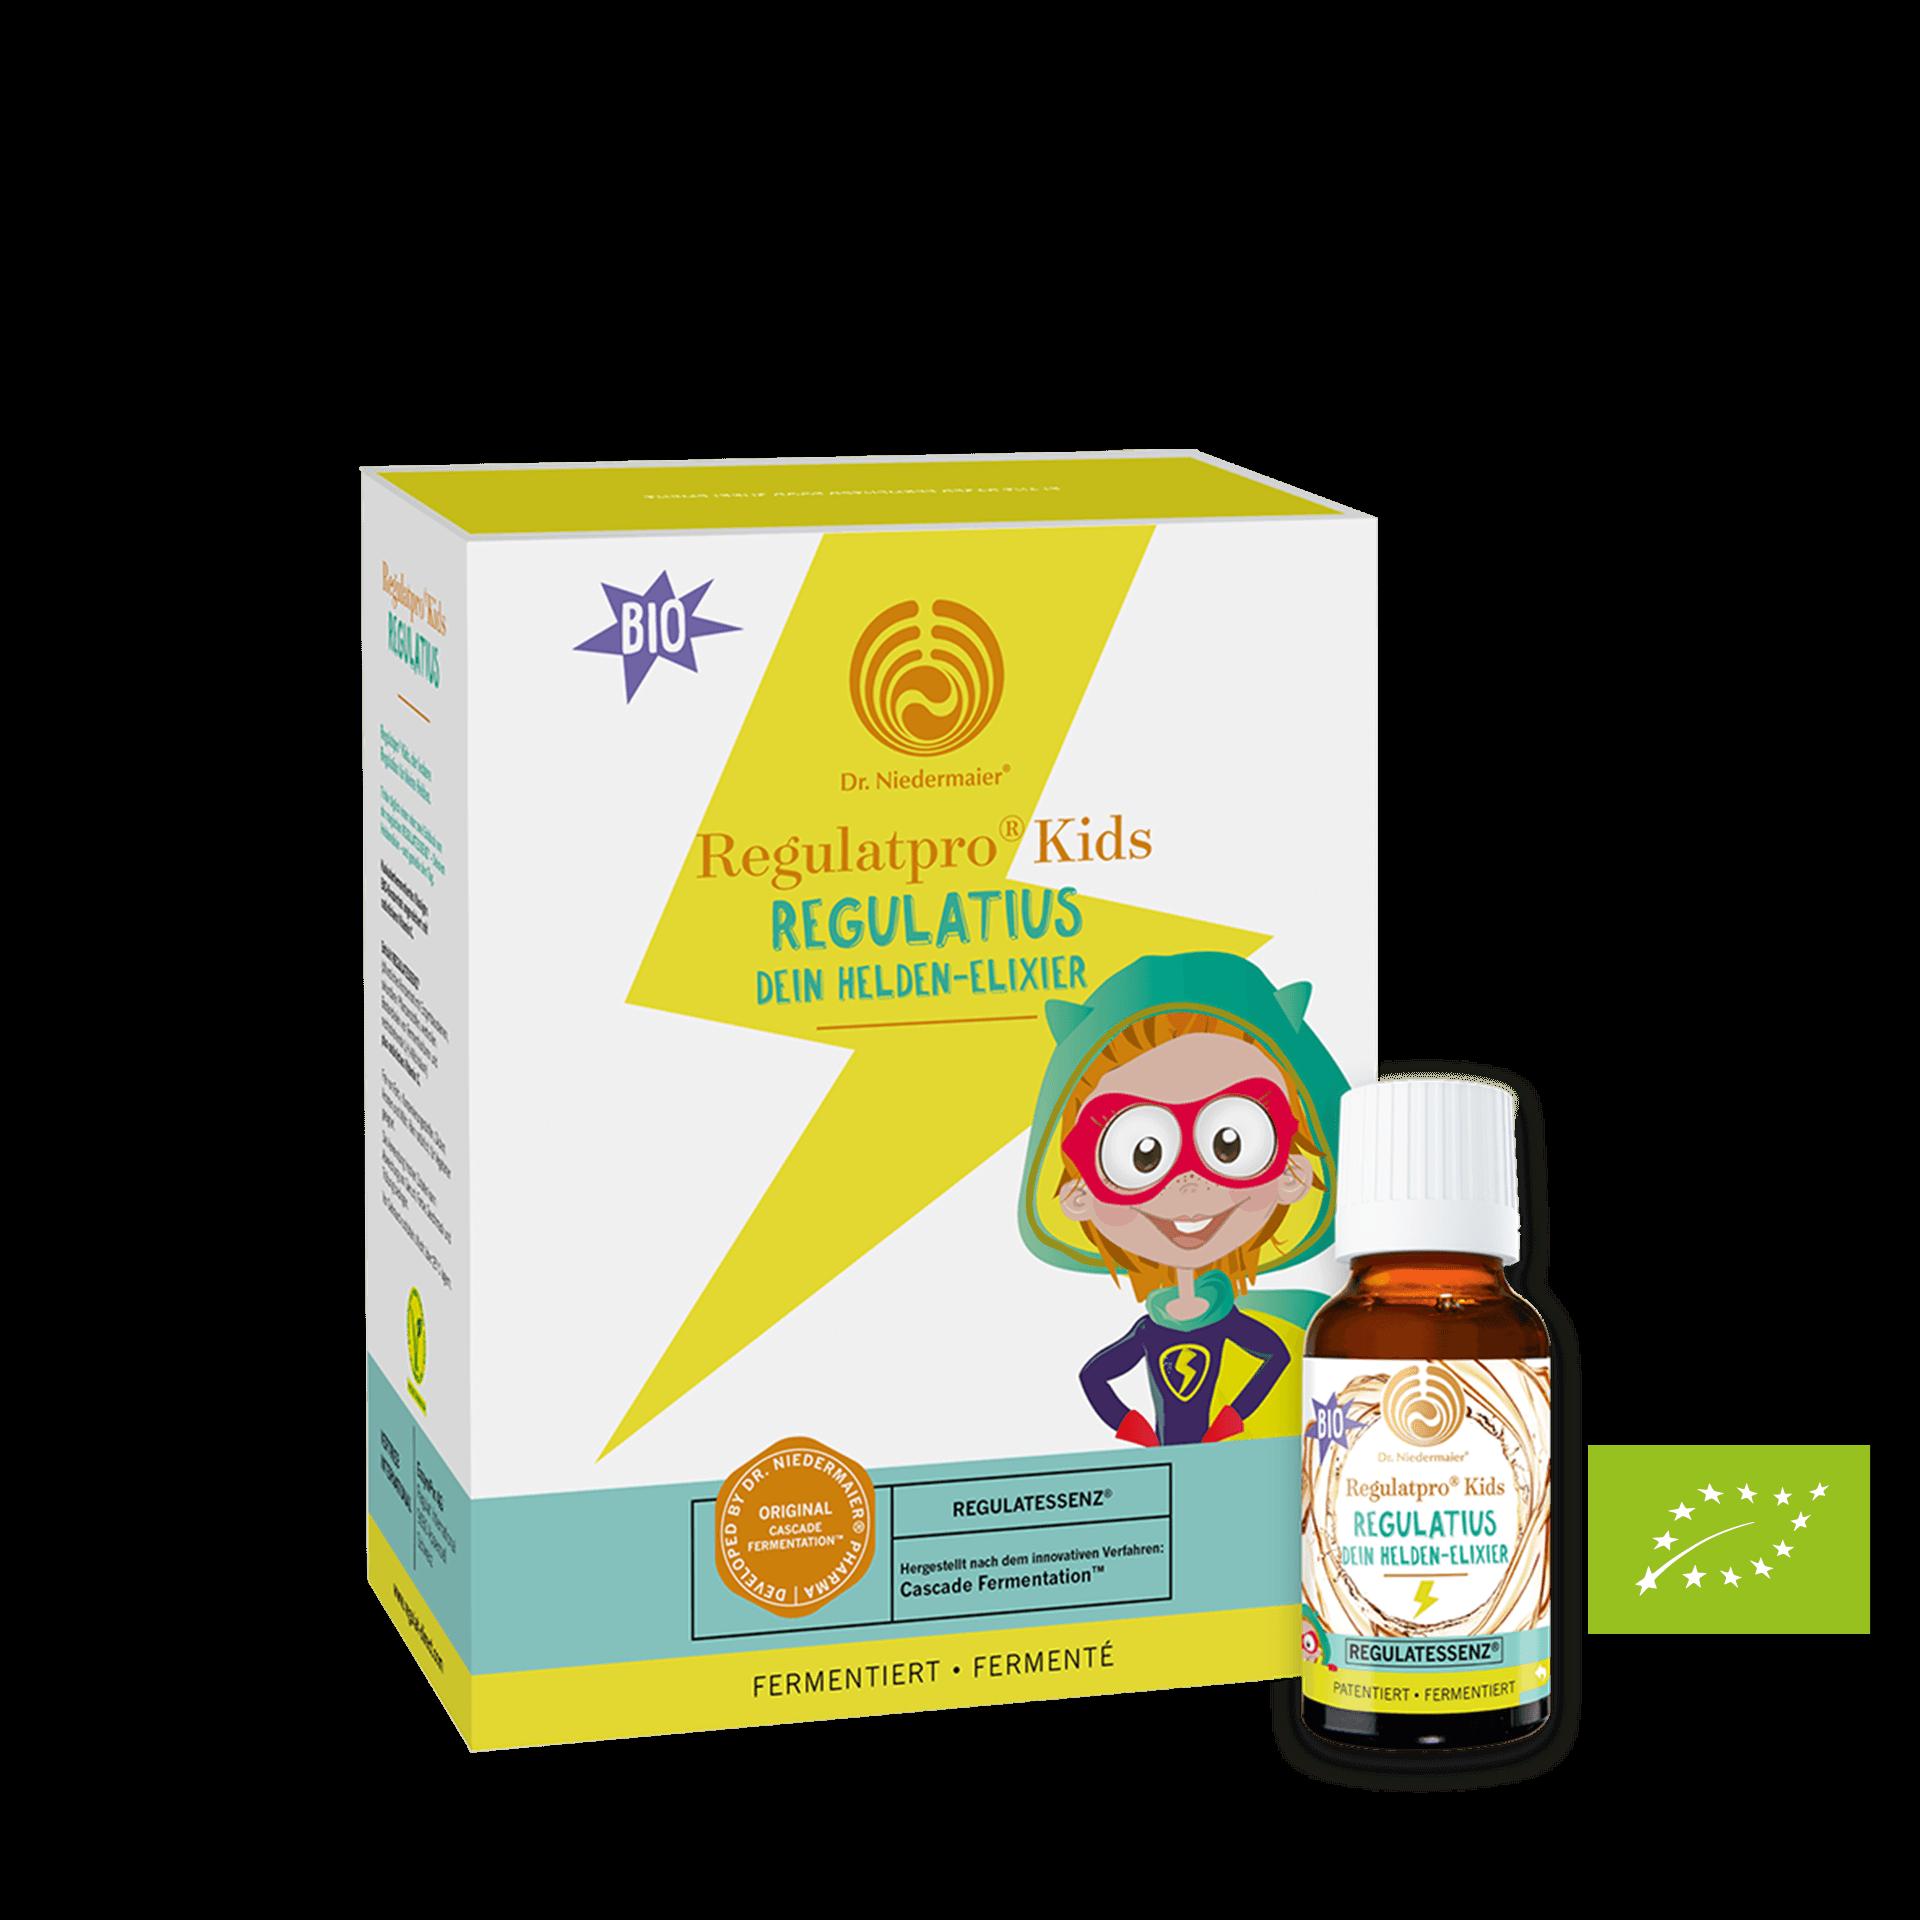 Regulatpro Kids Regulatius, 20 x 20 ml